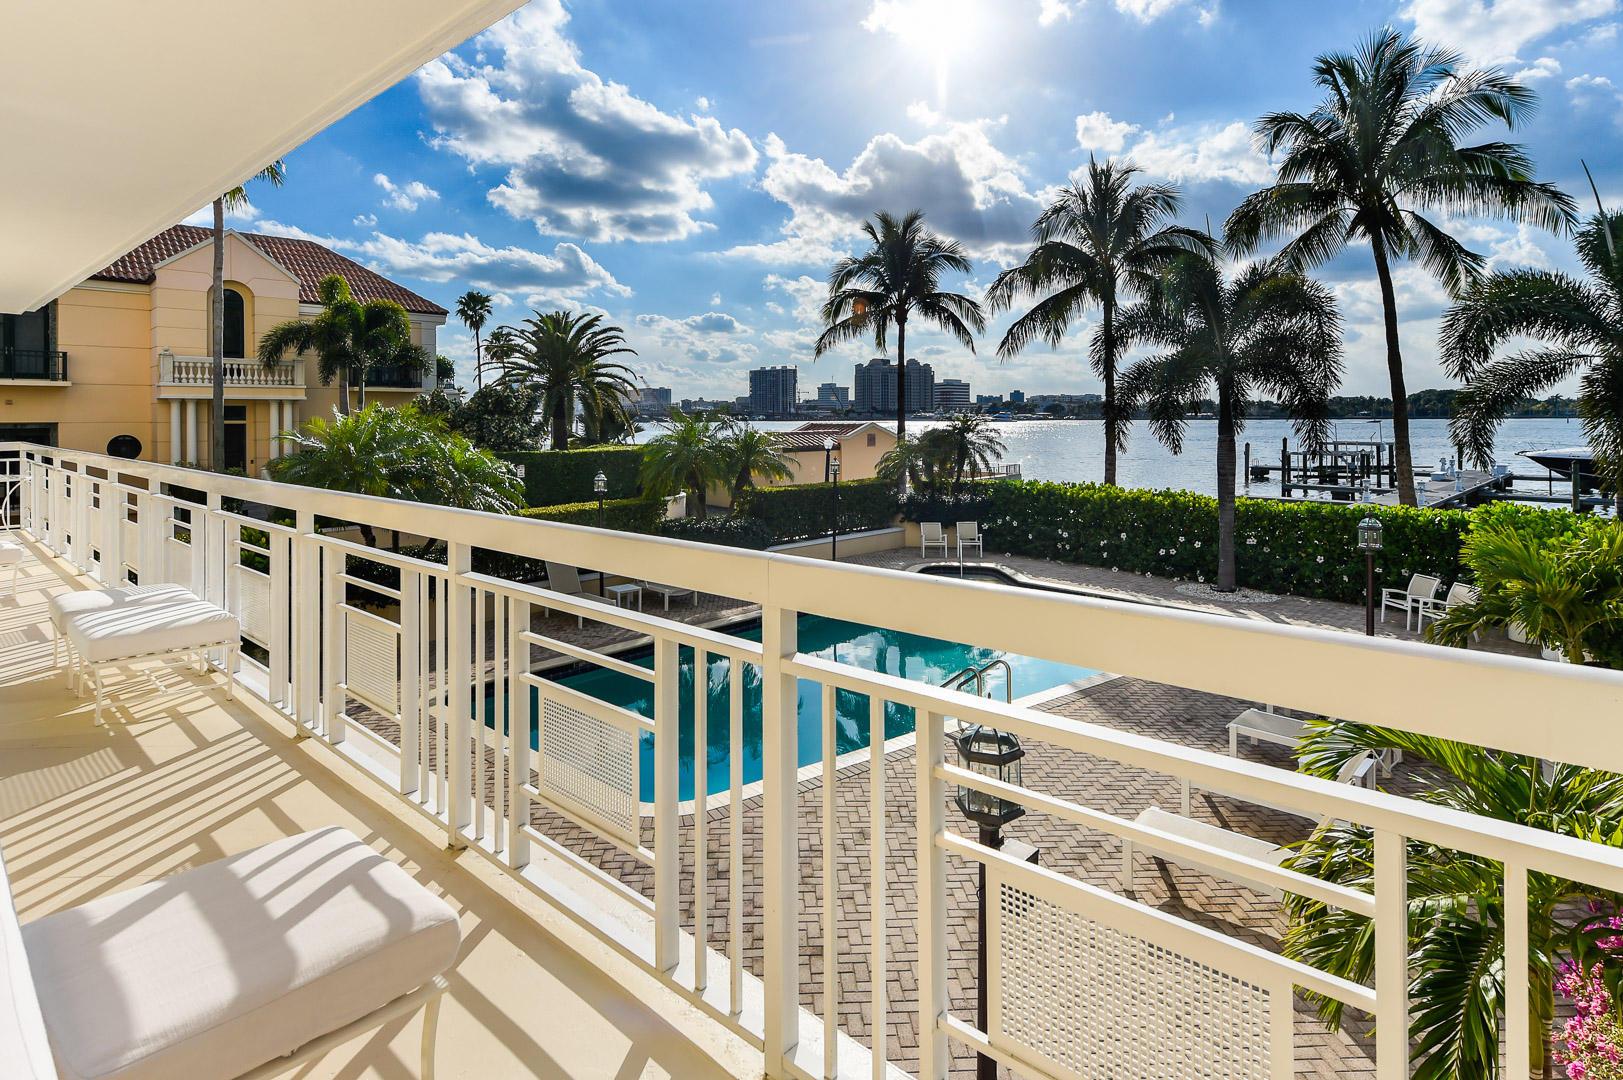 Fanjul Real Estate Palm Beach Florida